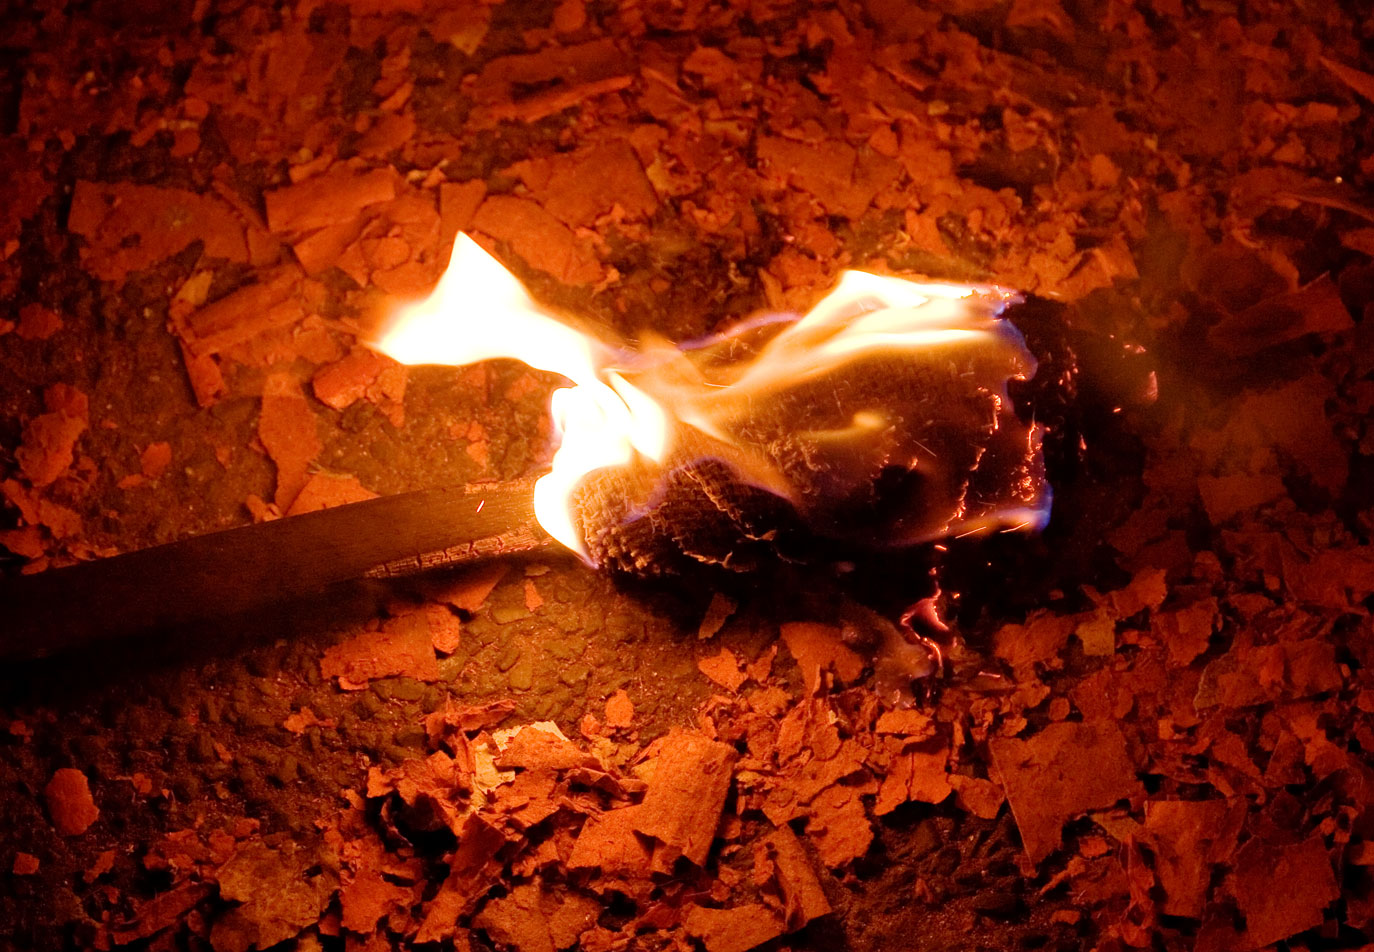 Torch - Wikipedia